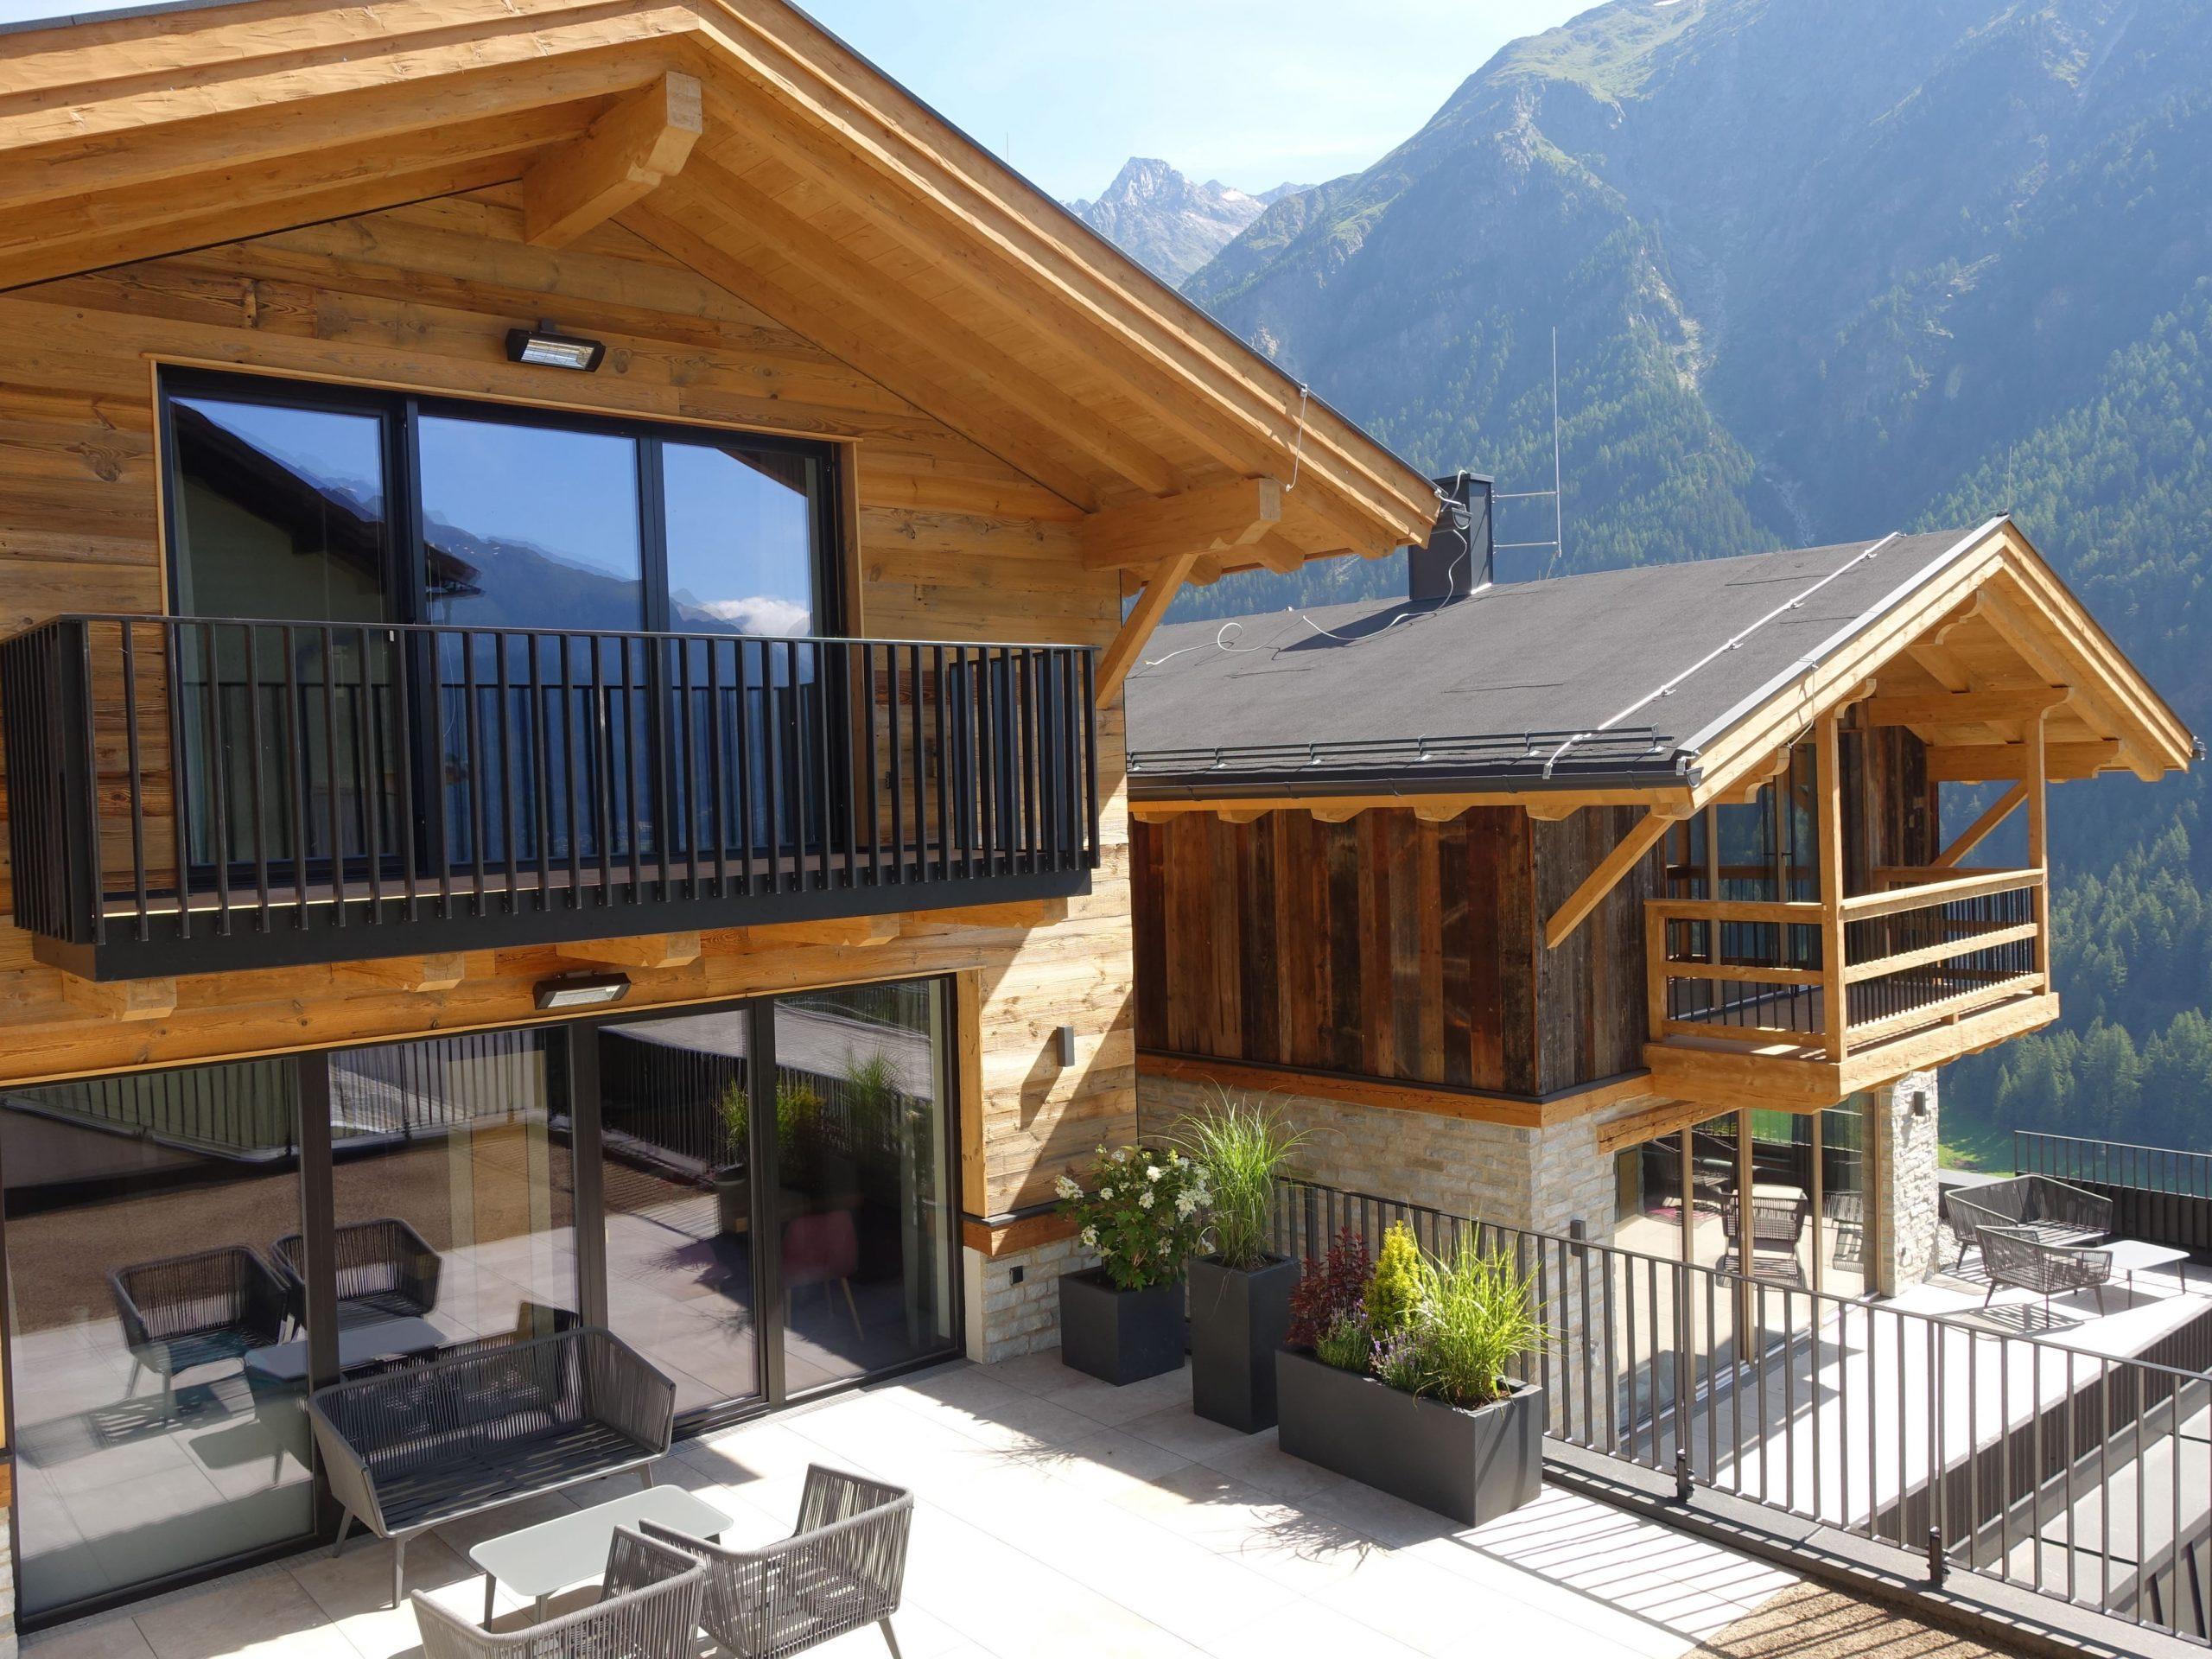 Chalet-appartement The Peak Bergsteiger Chalet - 6-7 personen